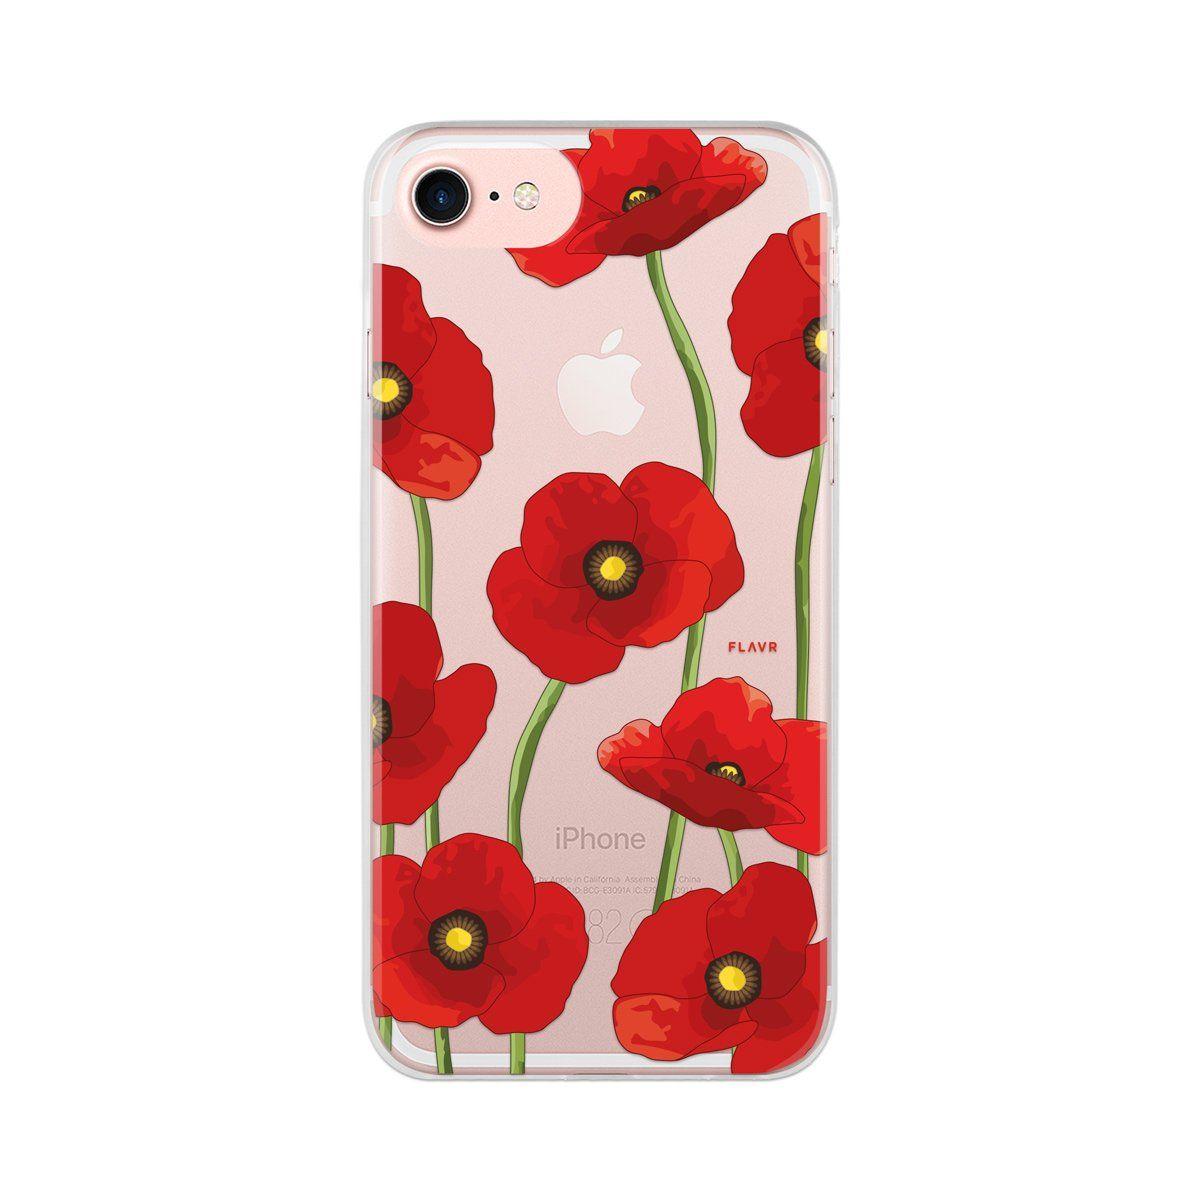 Ochranný kryt pro iPhone 8 / 7 / 6s / 6 - FLAVR, POPPY